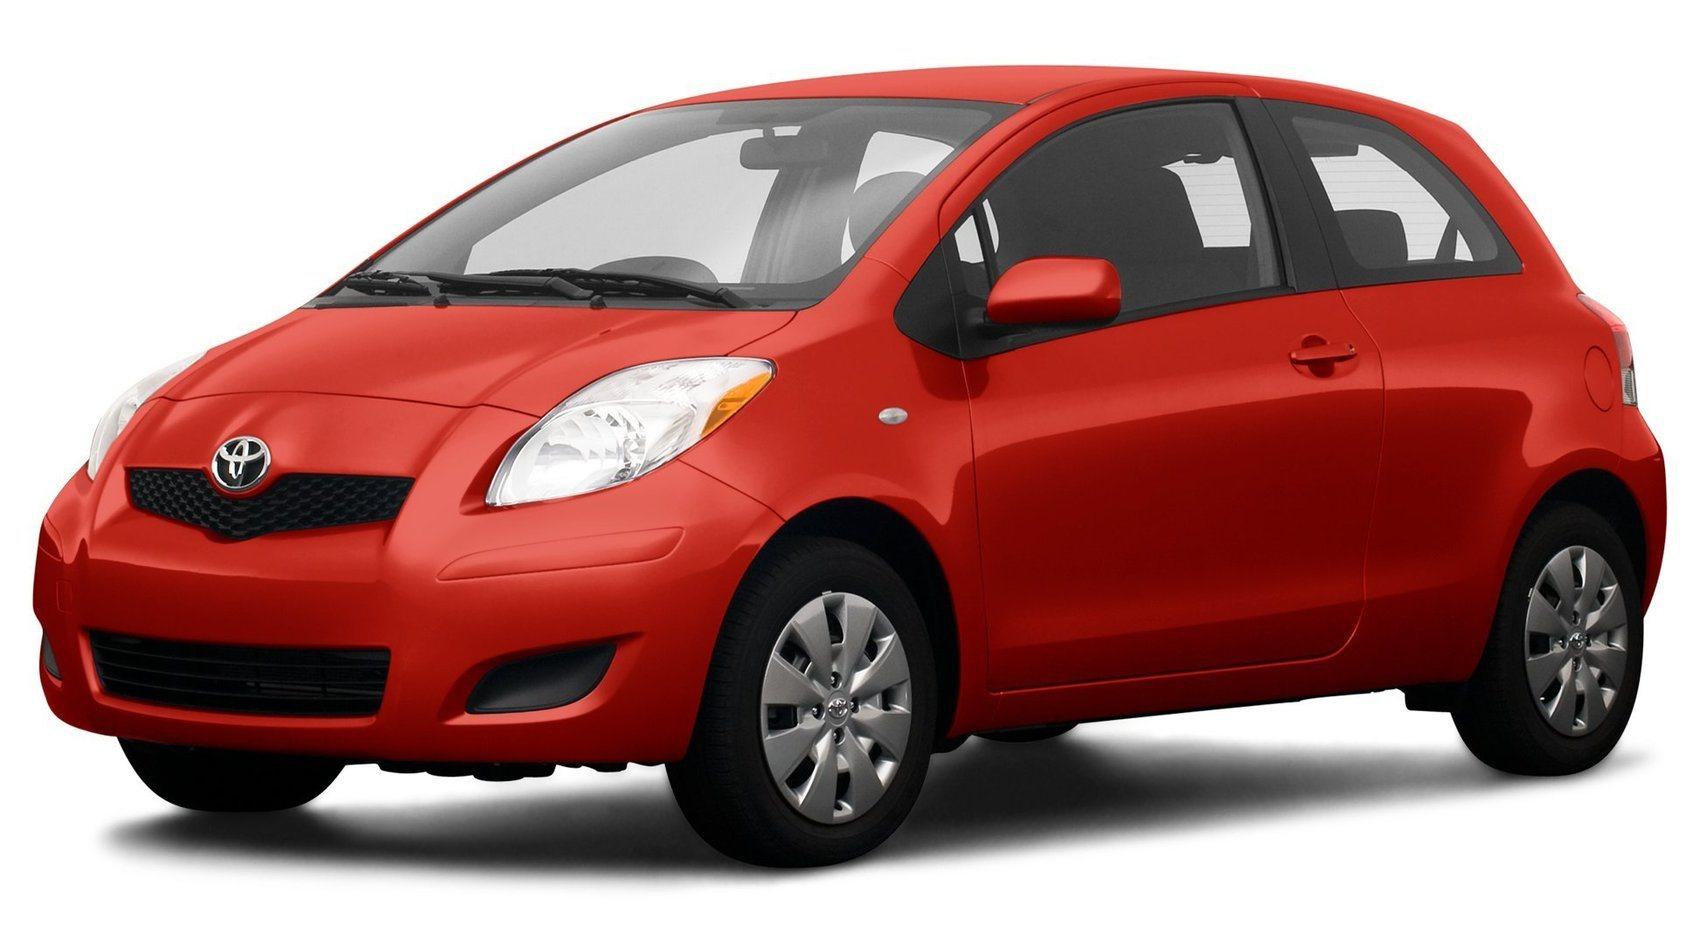 Kekurangan Toyota Yaris 2009 Tangguh